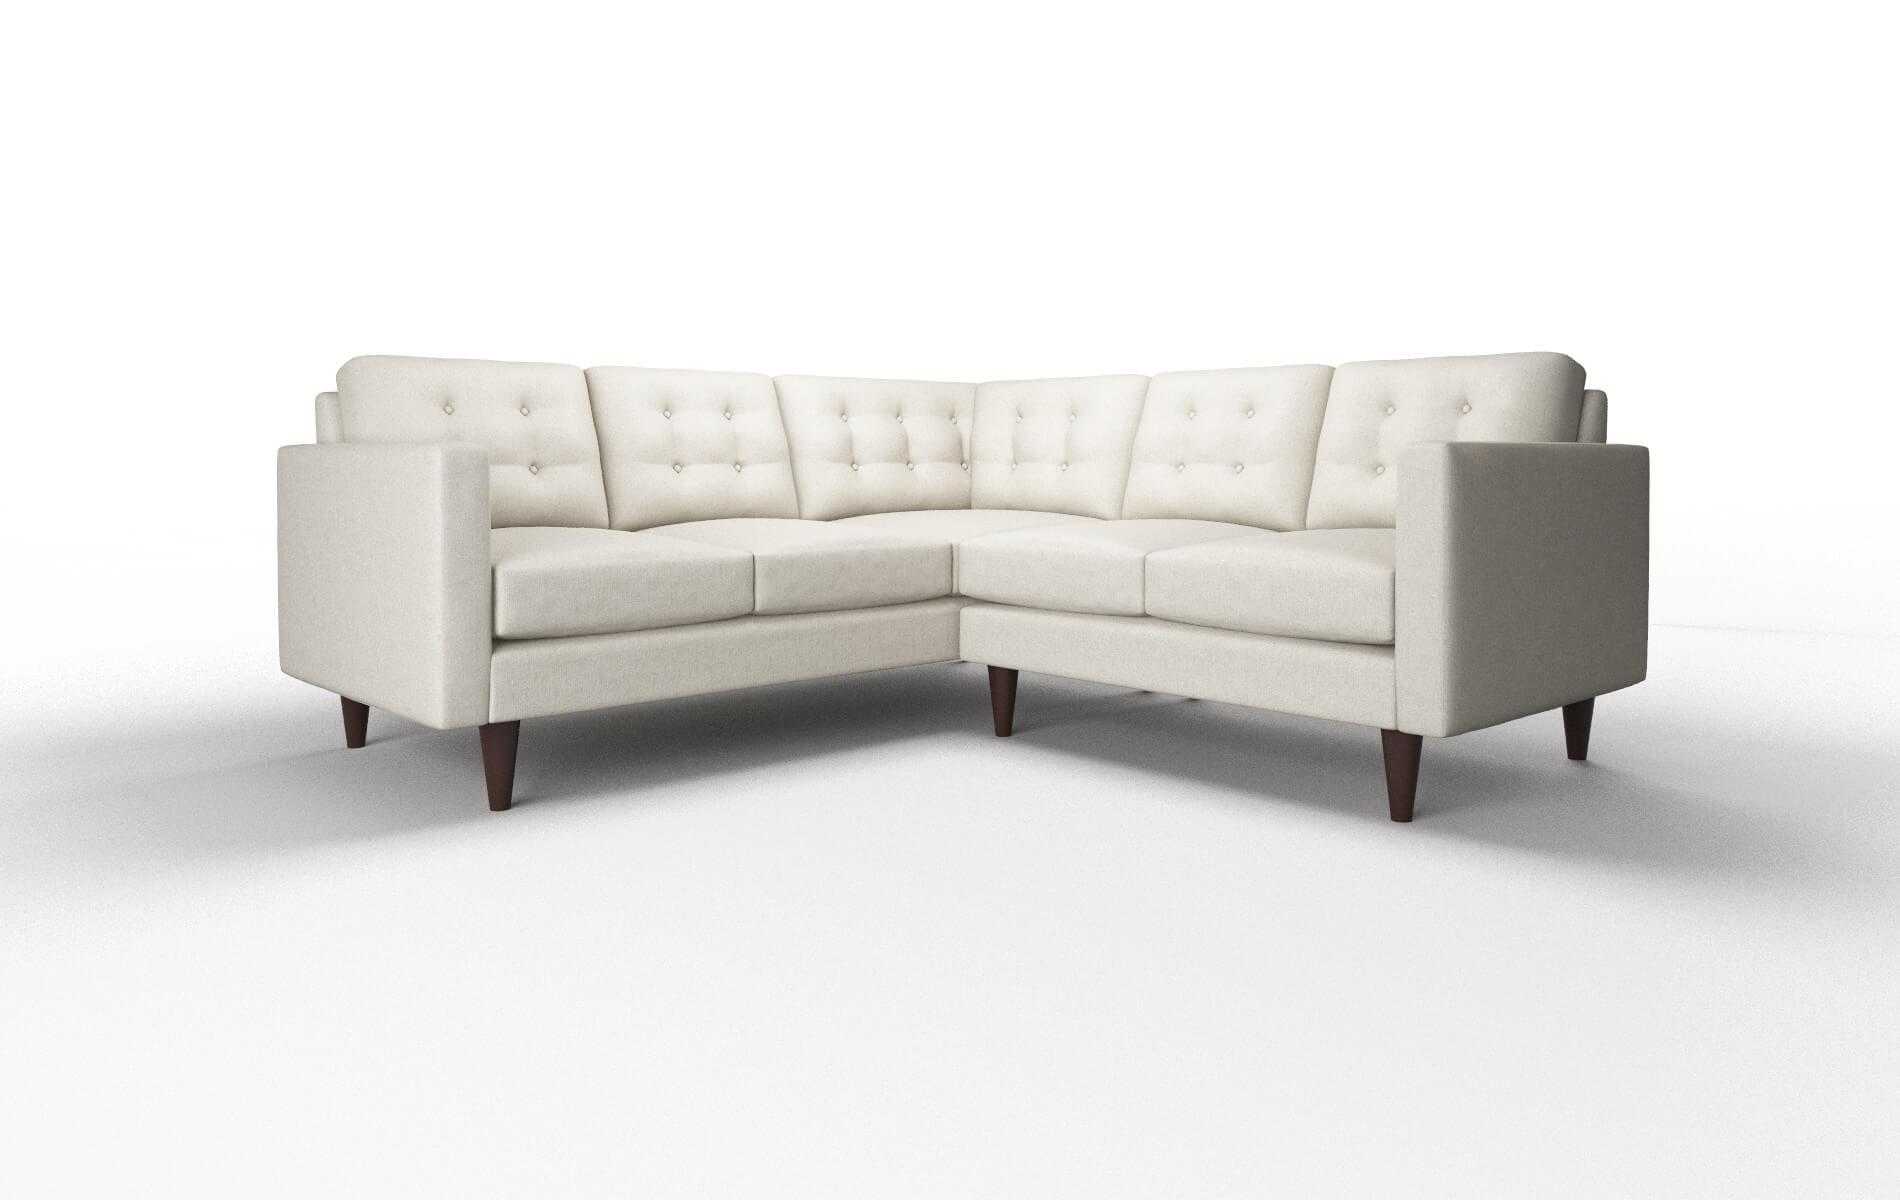 Turin Sasha Linen chair espresso legs